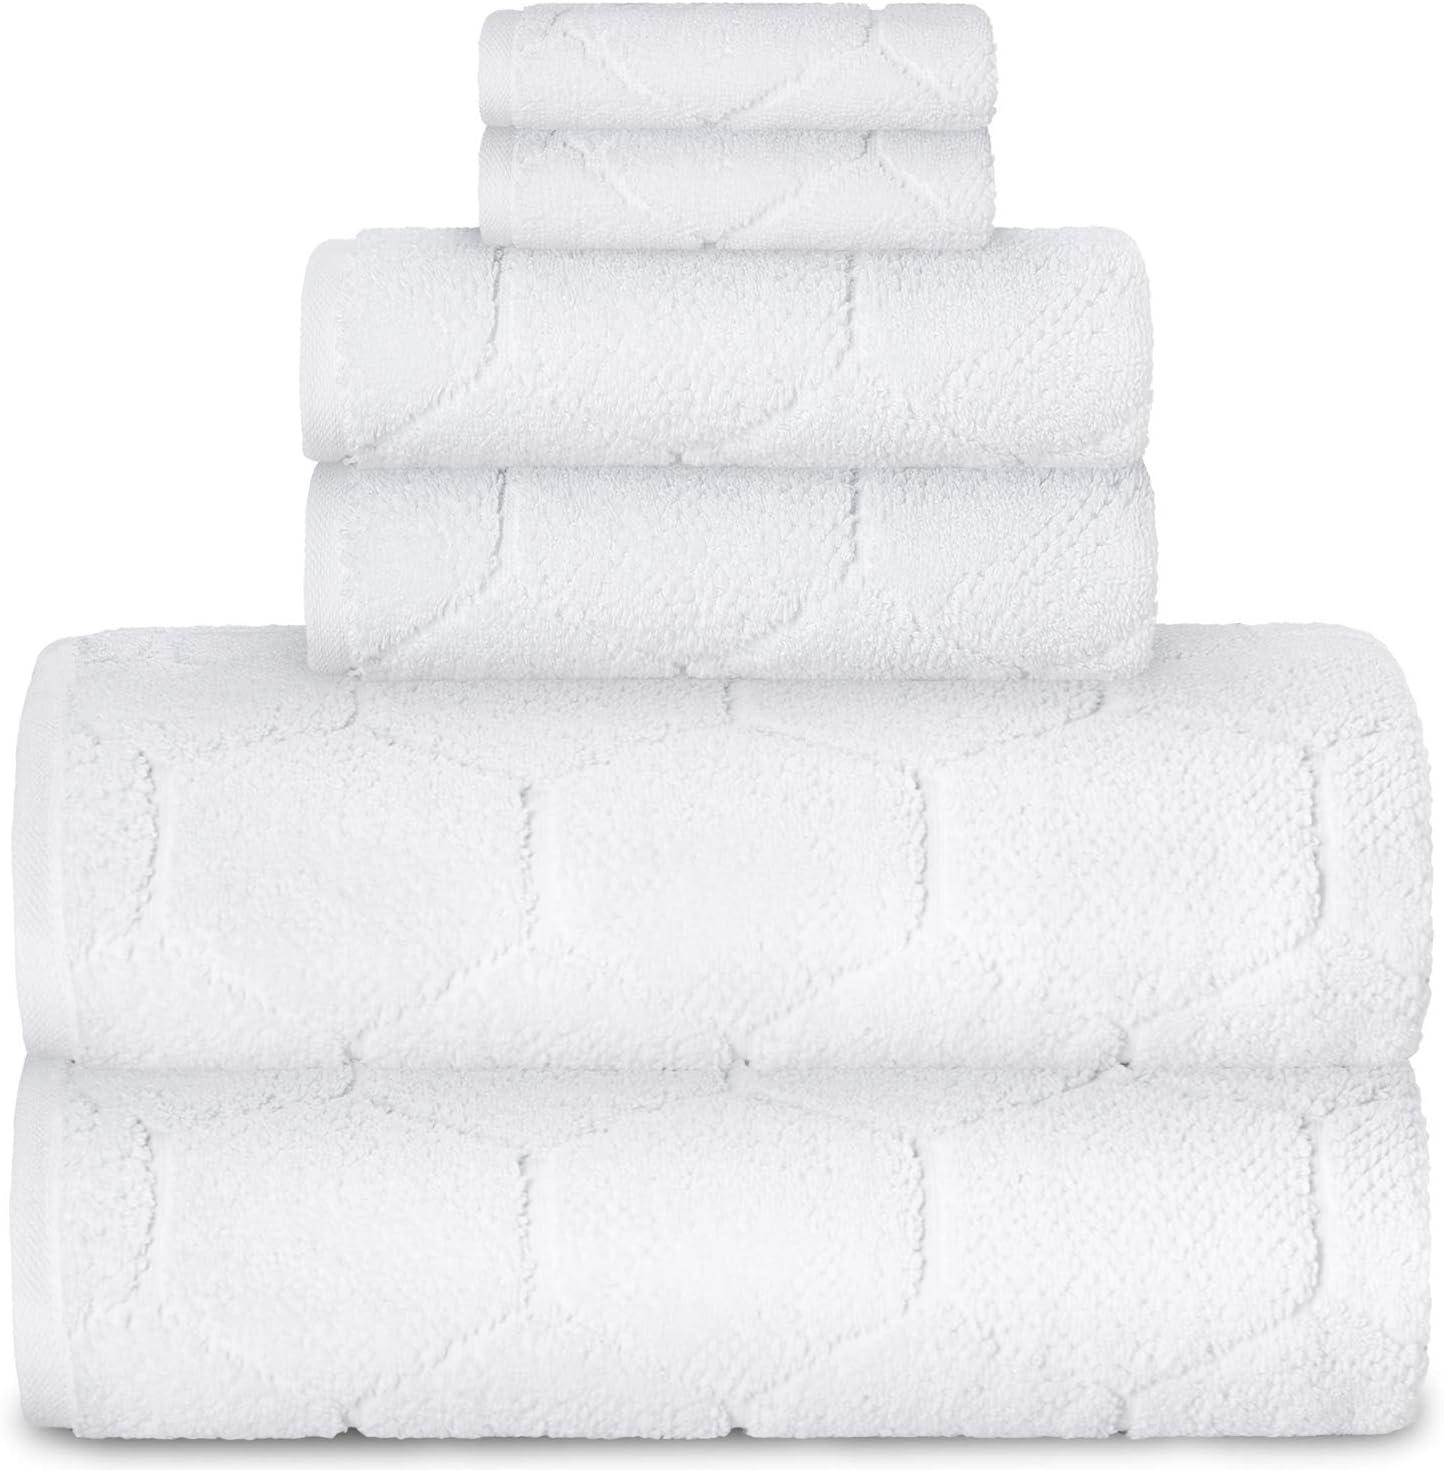 AROW9 - 6 Piece Luxury Towel Set 750 GSM 100% Turkish Cotton – Hand, Wash & Bath - Premium Quality Decorative & Soft - Fancy Home Guest Bathroom & Spa Towels - Elegant Mod Lux Design - White